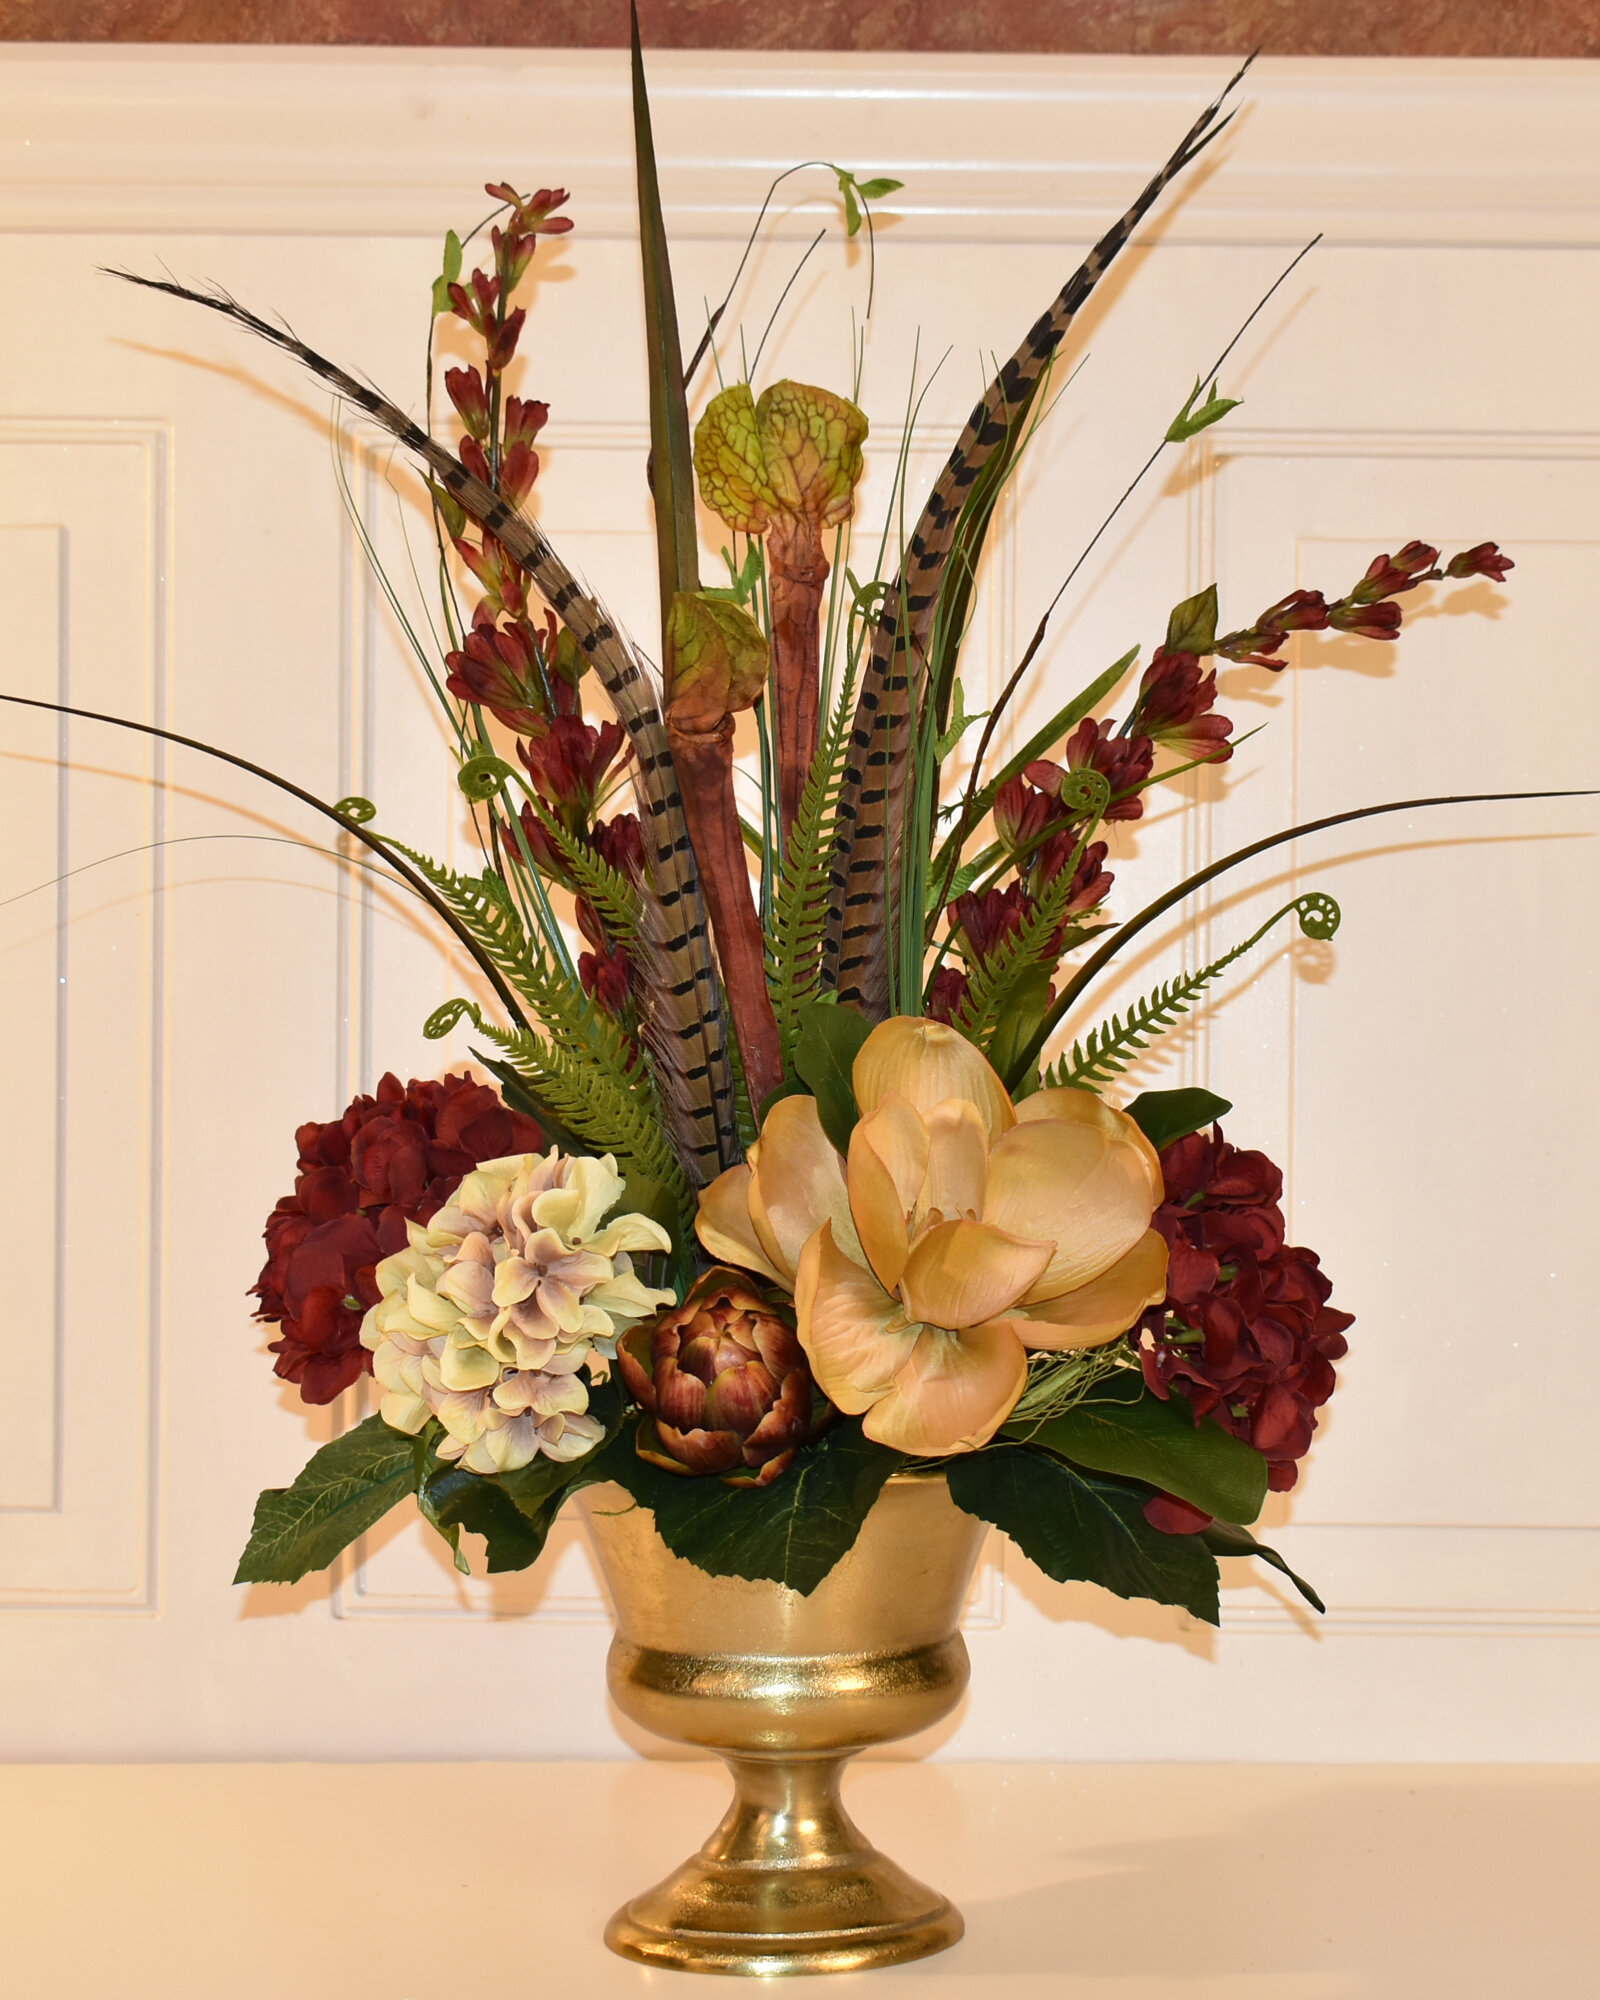 Floral Home Decor Elegant Magnolia And Hydrangea Floral Arrangement In Gold Urn Wayfair